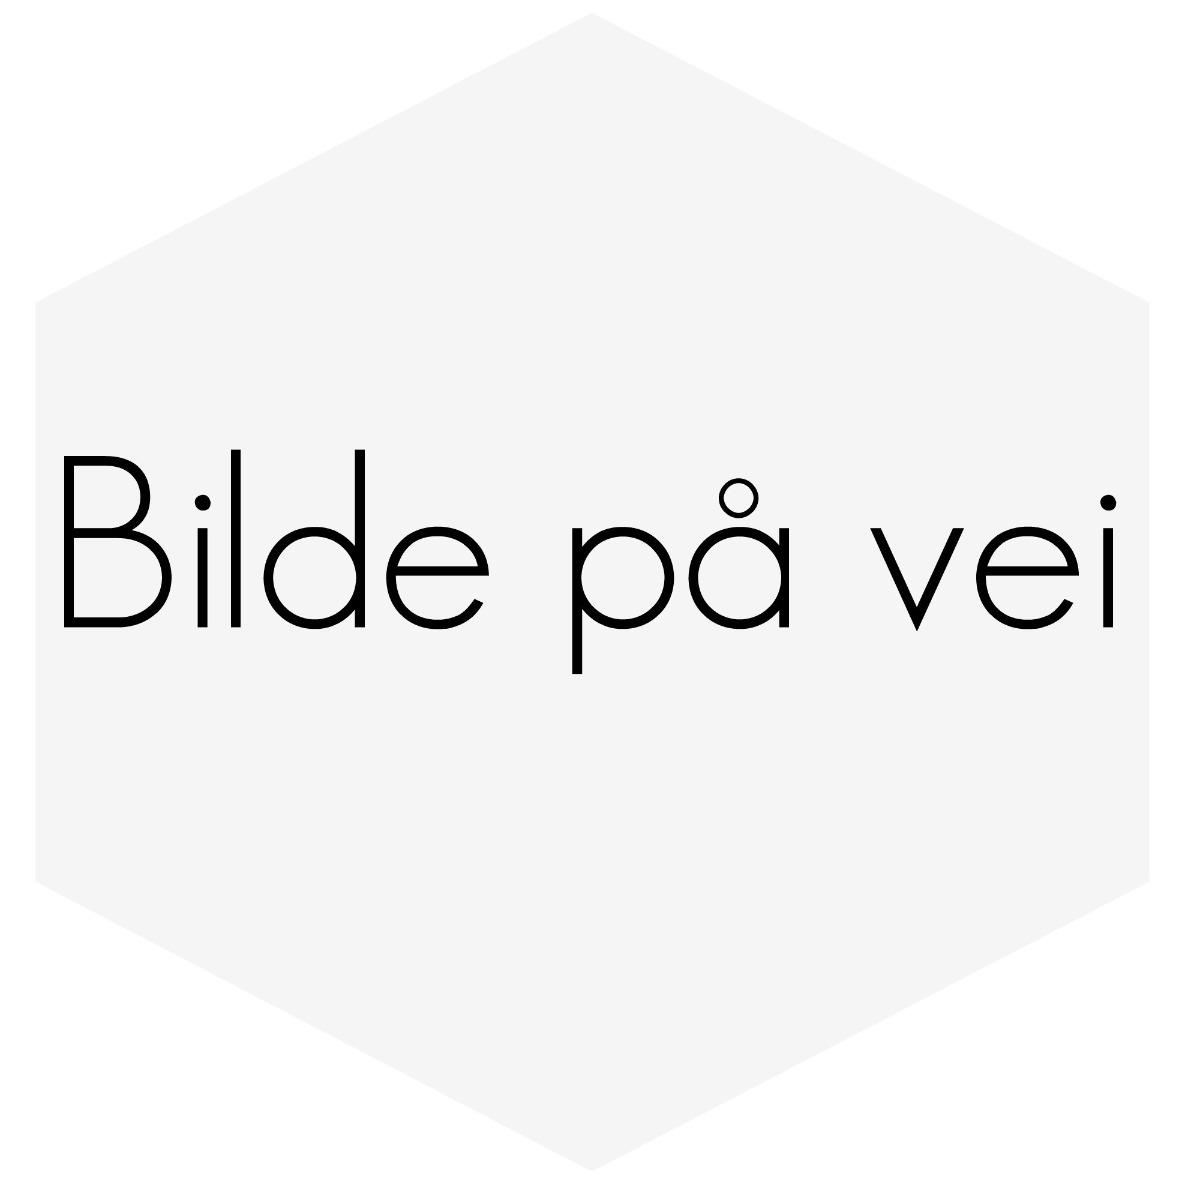 "SILIKONSLANGE RØD REDUSERING 2,25-3"" (57-76MM)"